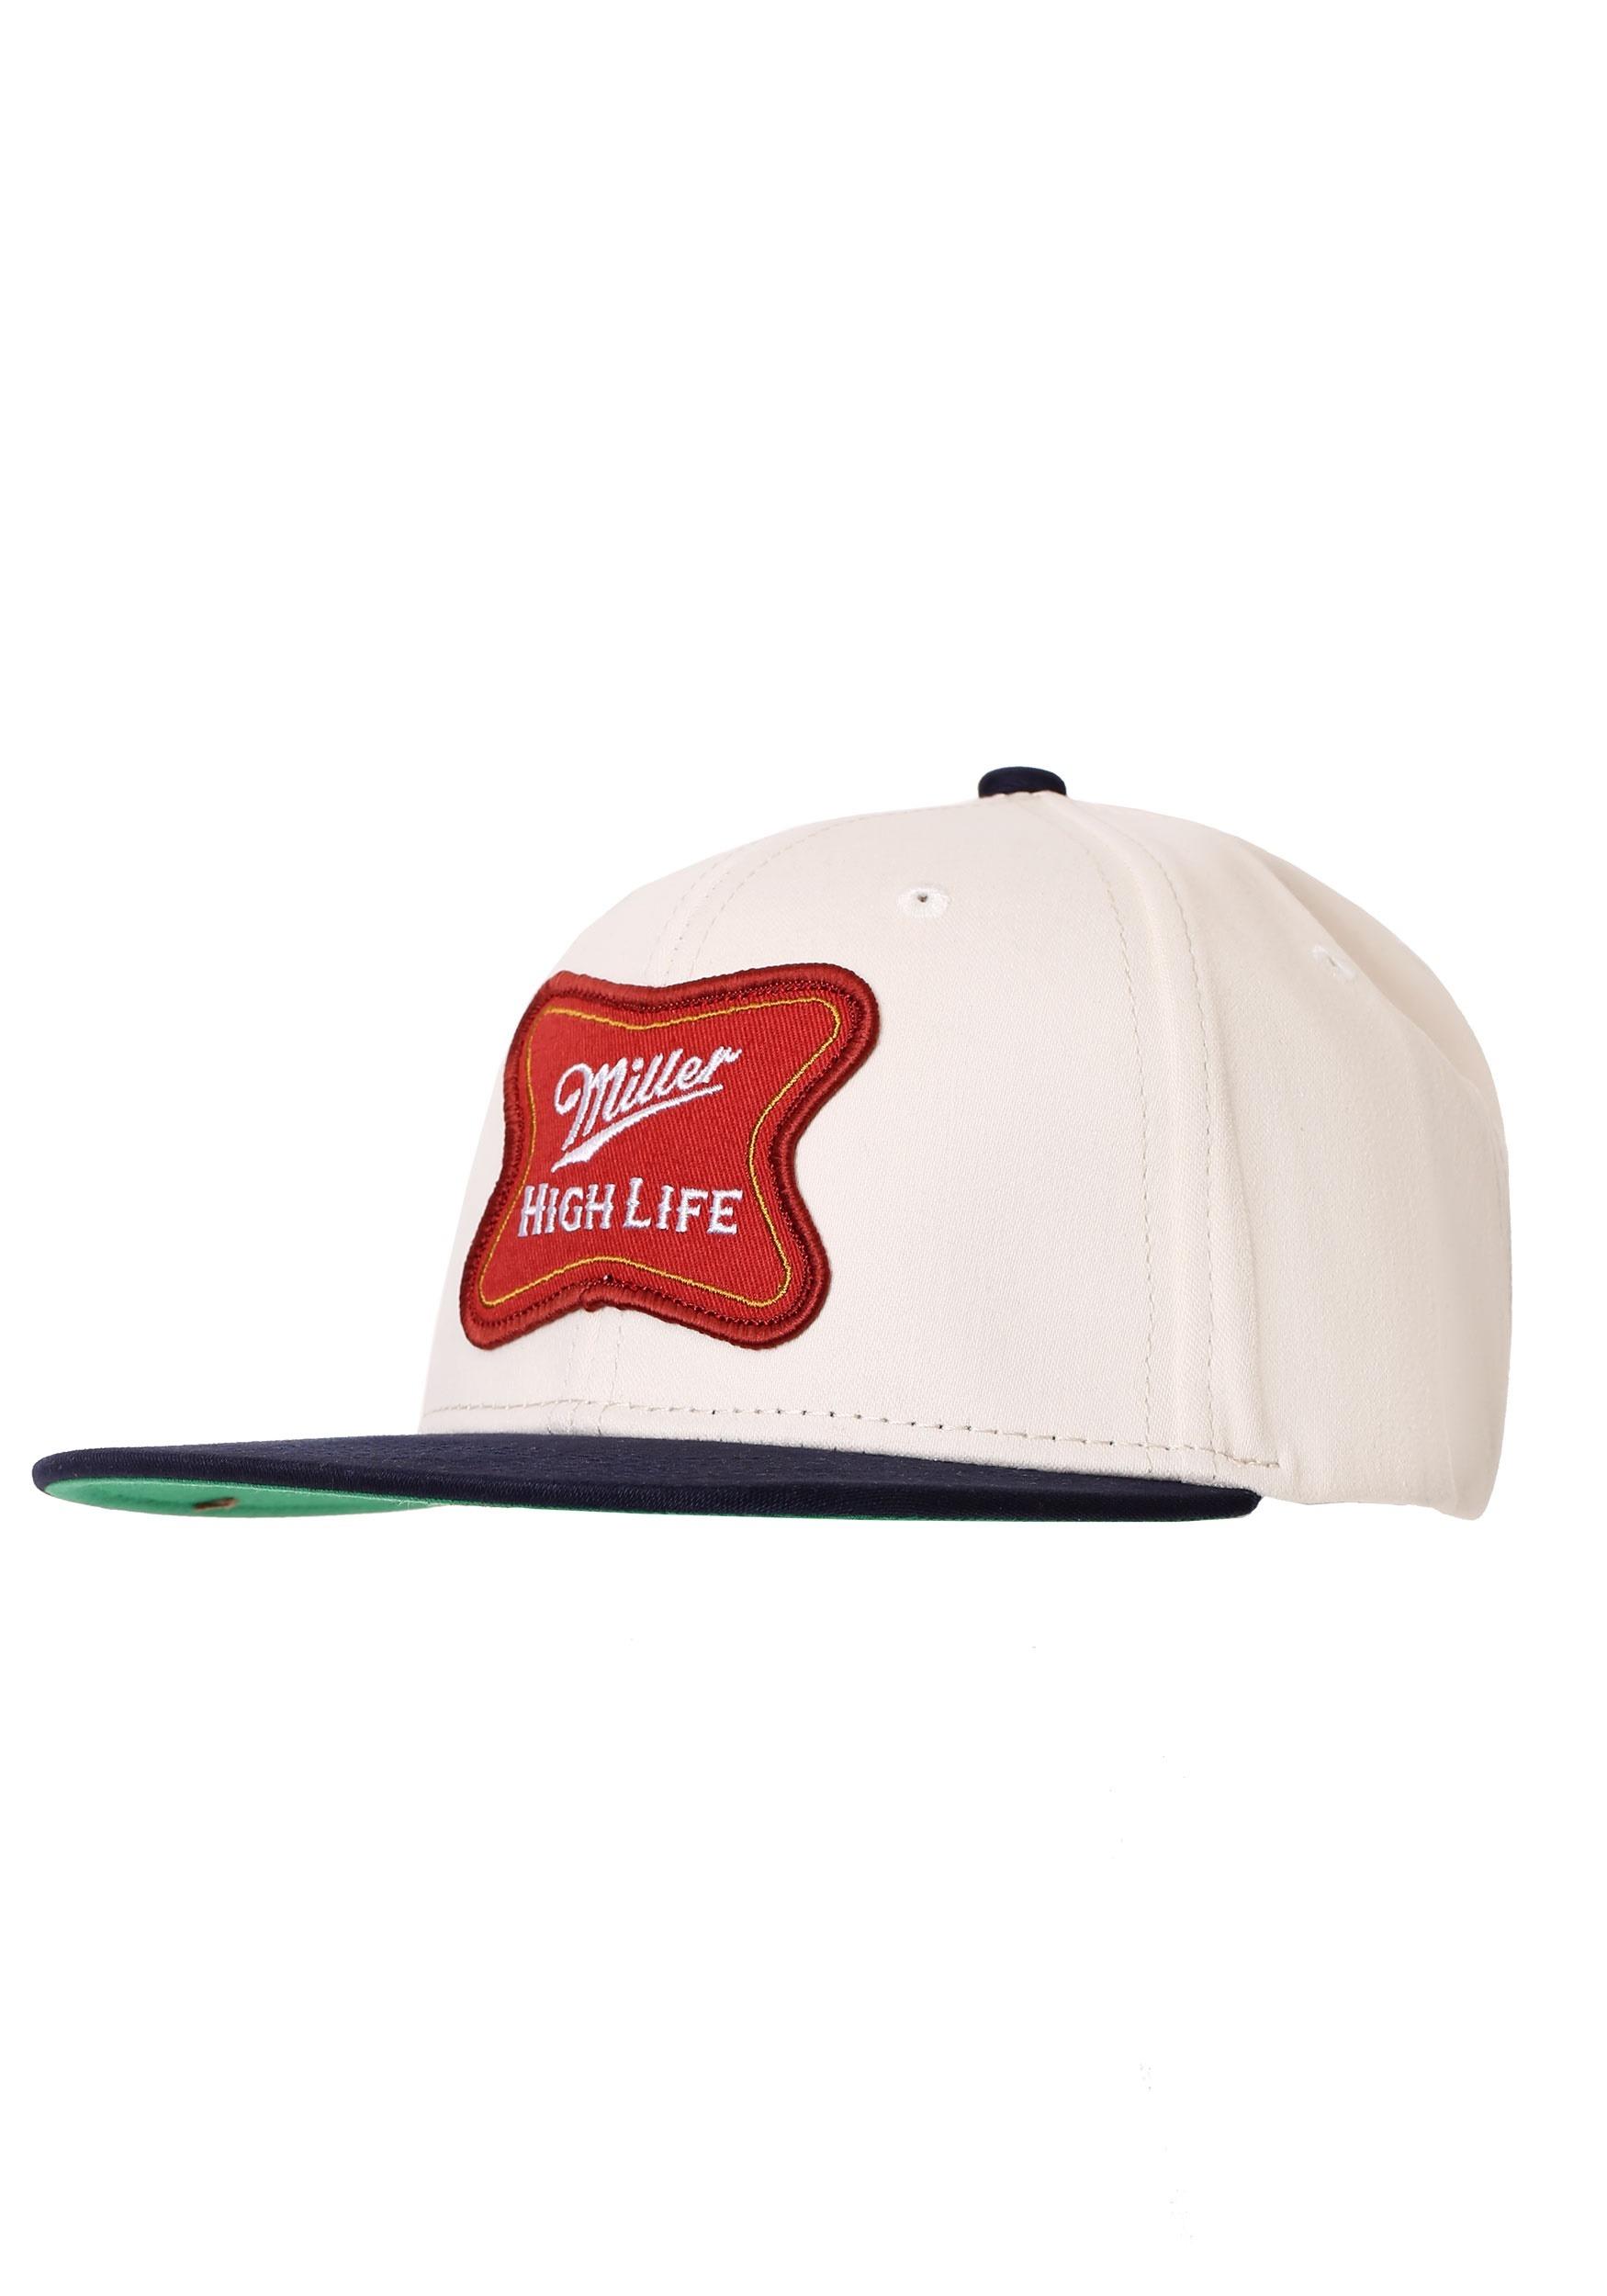 5ef0fe8b65e Miller high life logo cotton twill snapback hat alt jpg 1750x2500 High life  hat